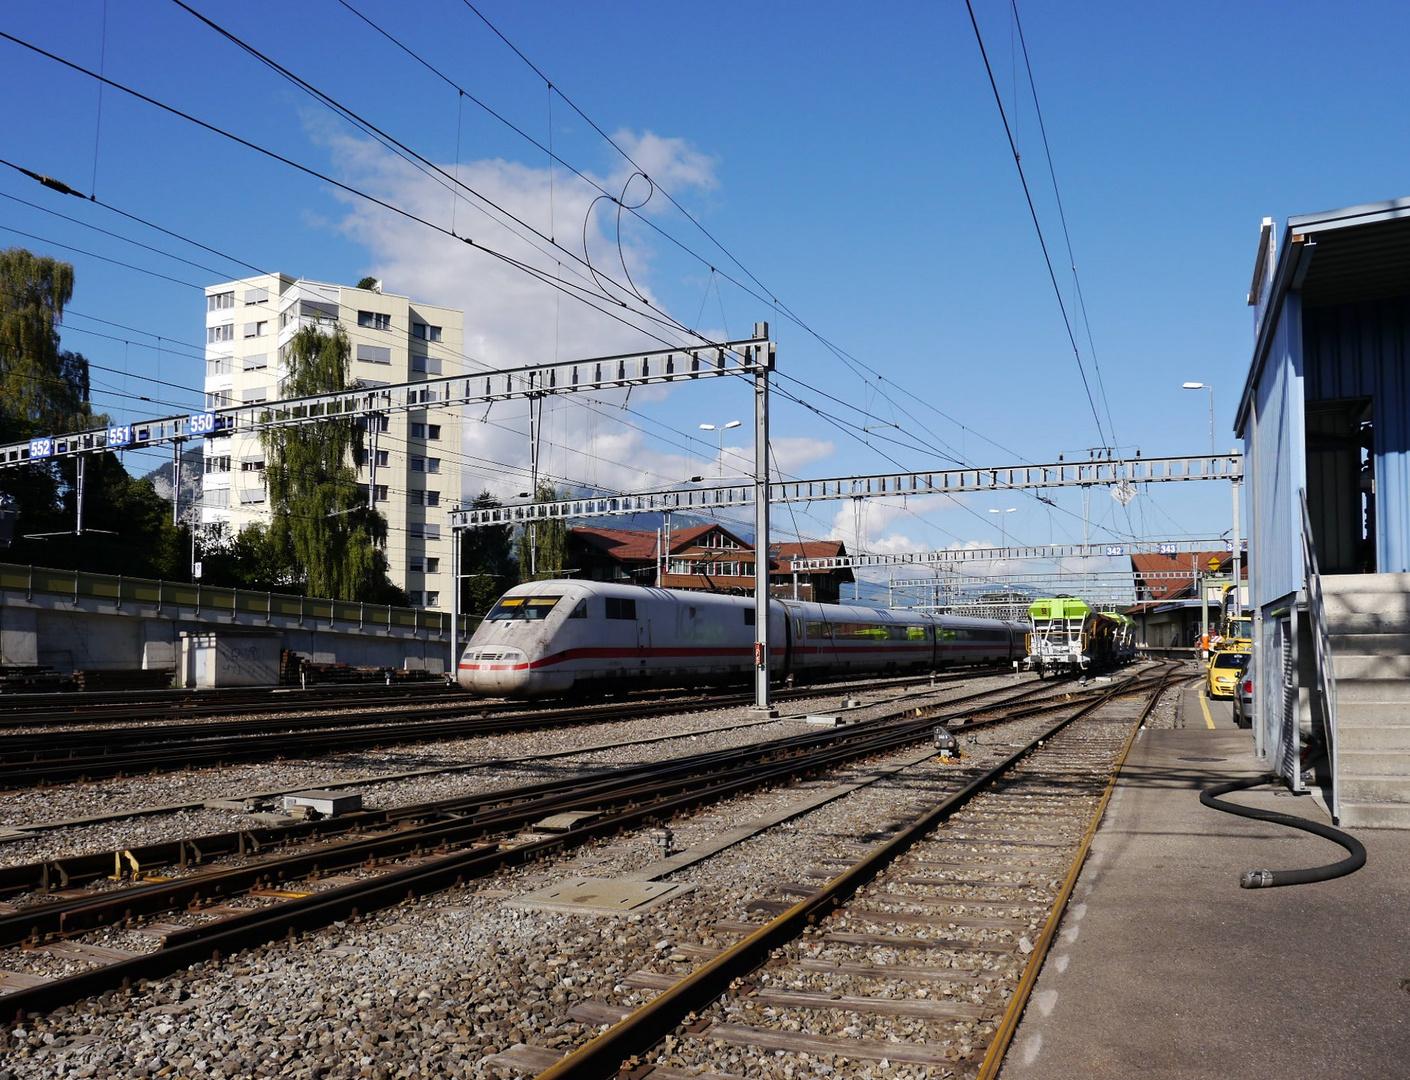 Ausfahrt aus dem Bahnhof Spiez